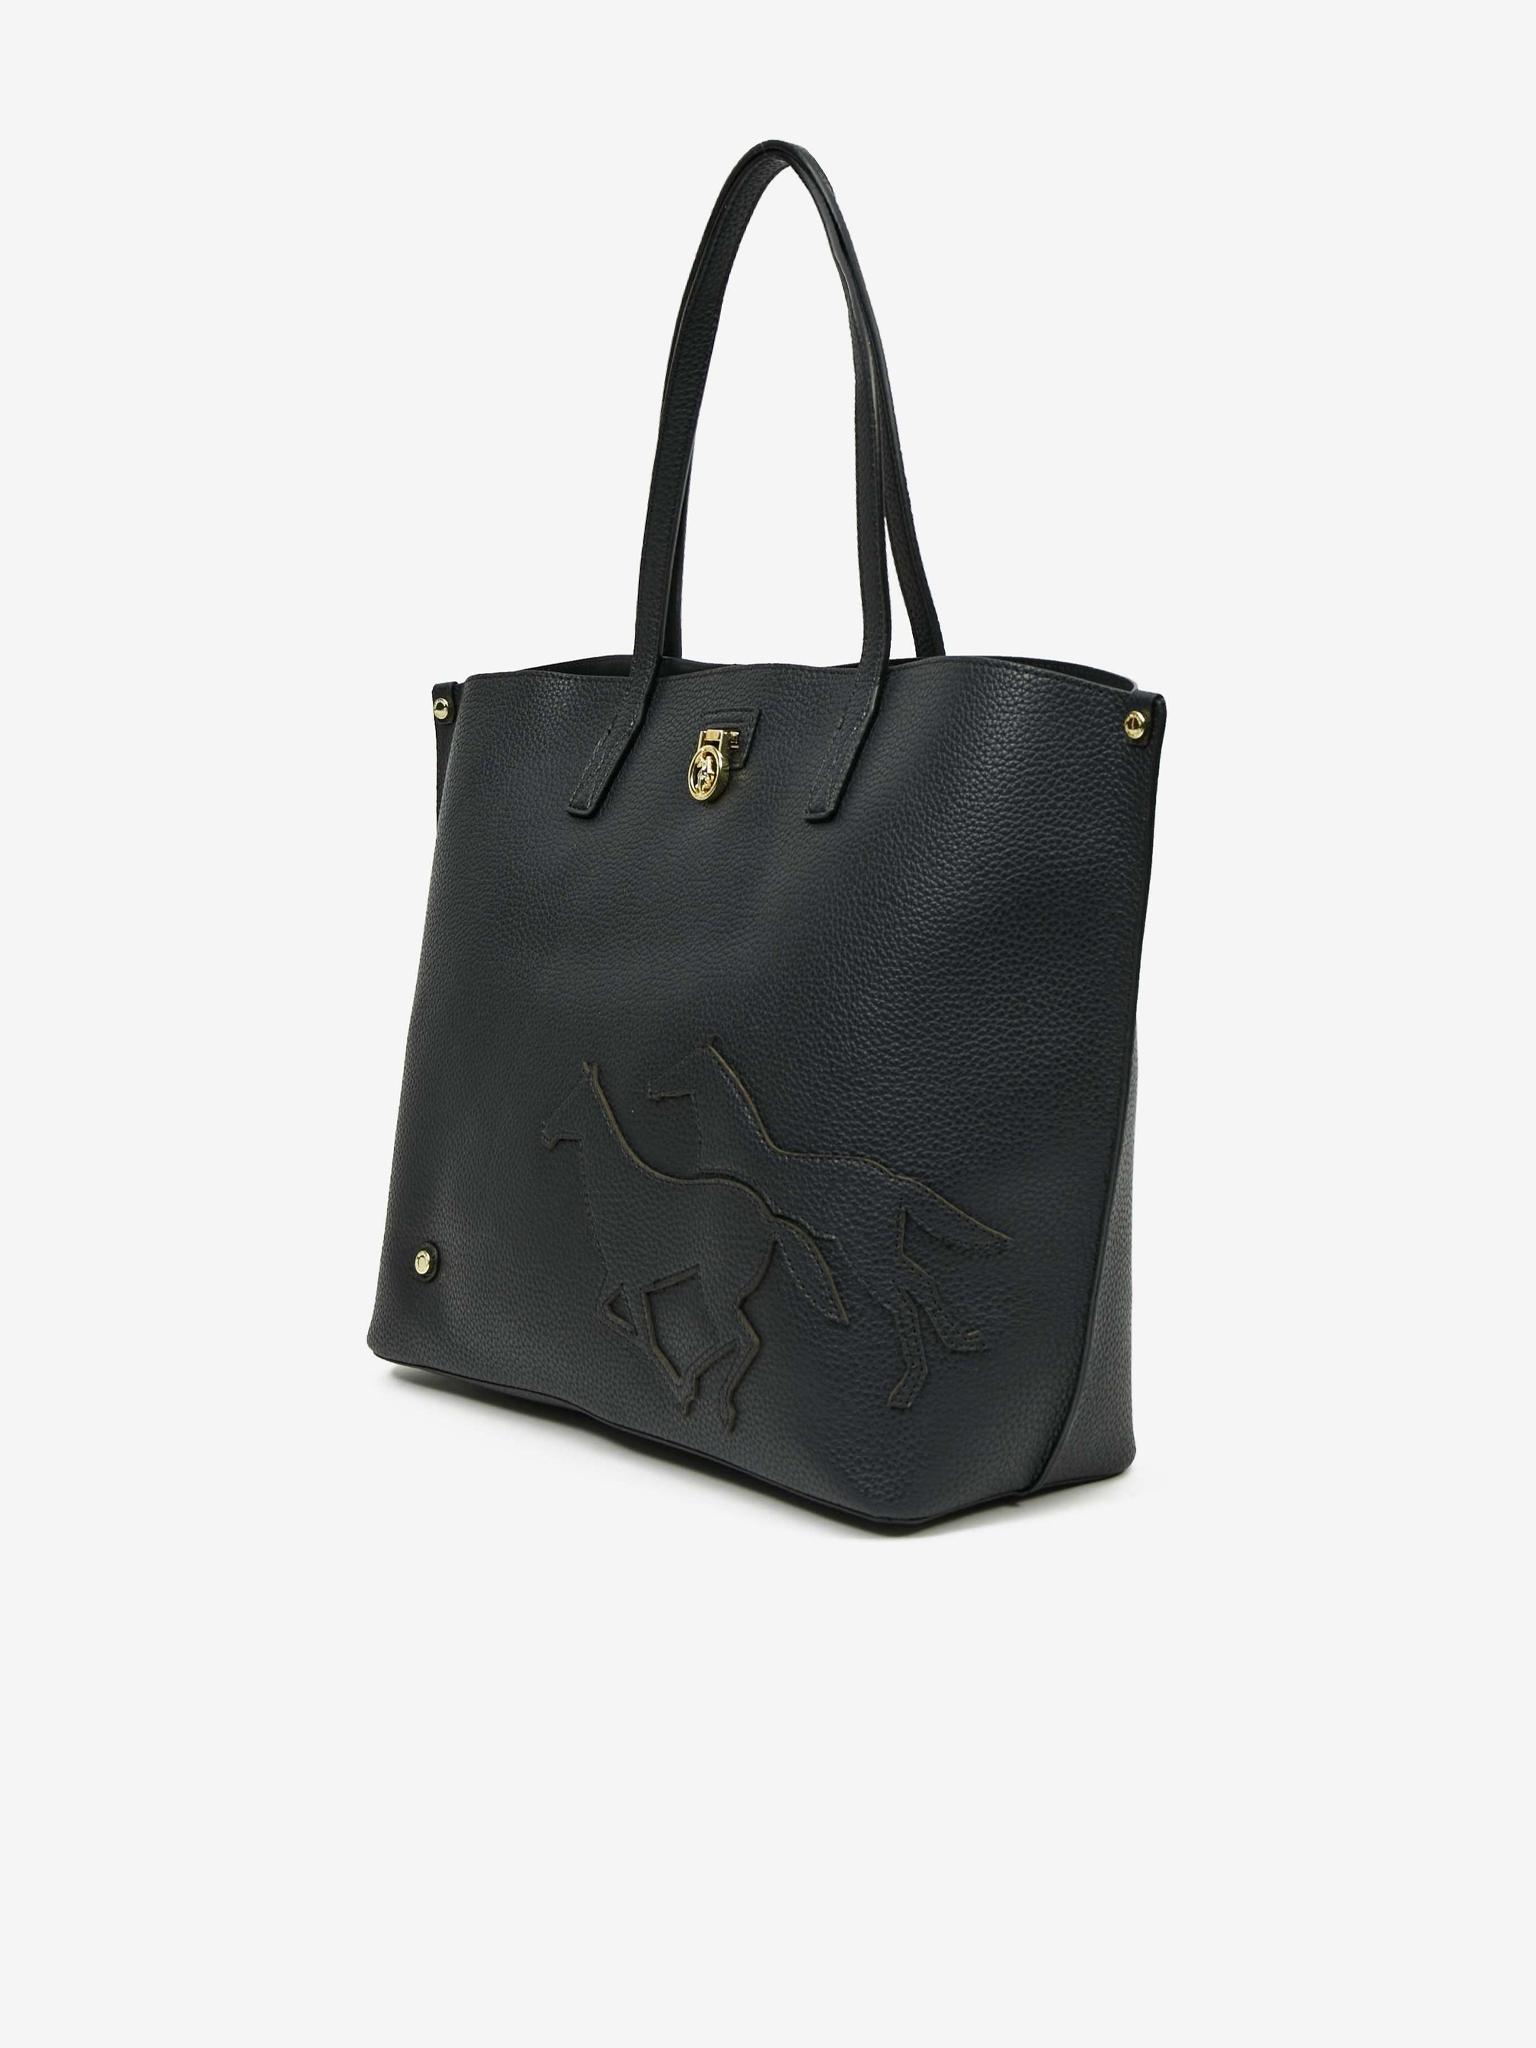 U.S. Polo Assn. Borsetta donna nero  Large